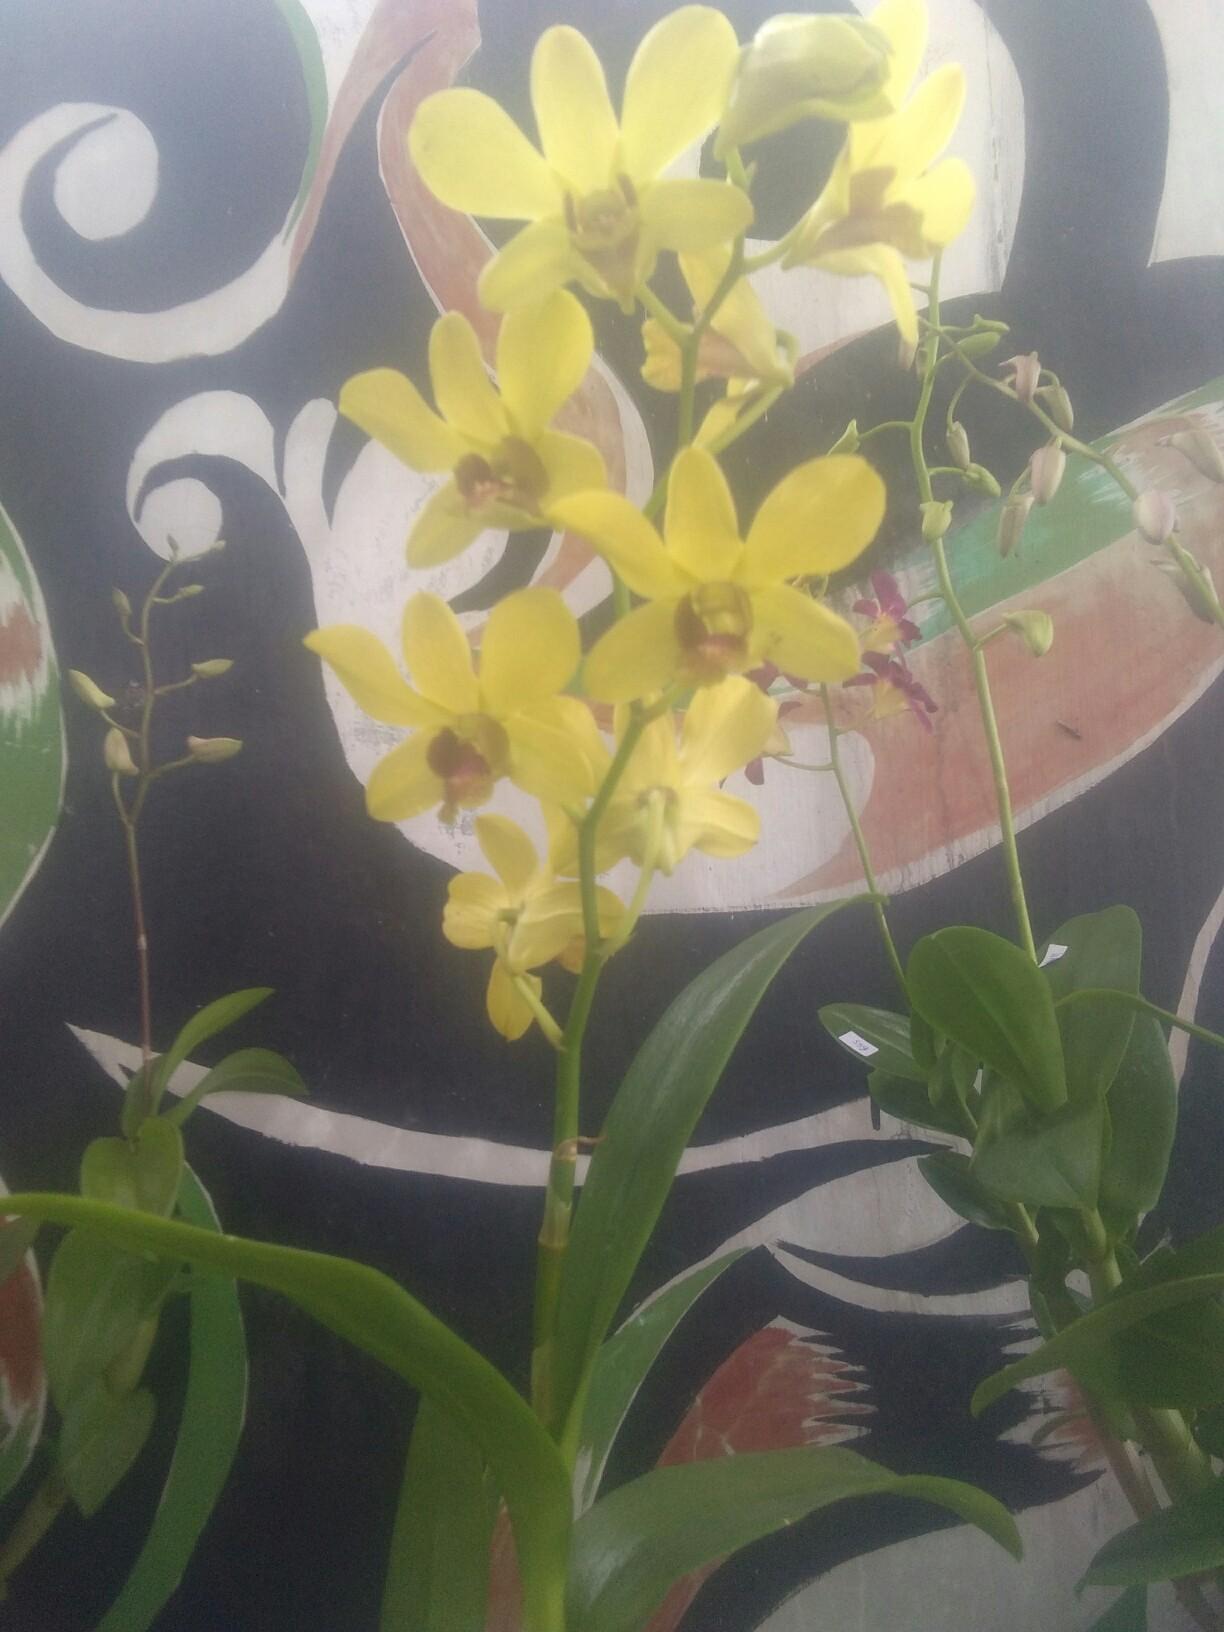 Bibit bunga anggrek dendro warna kuning